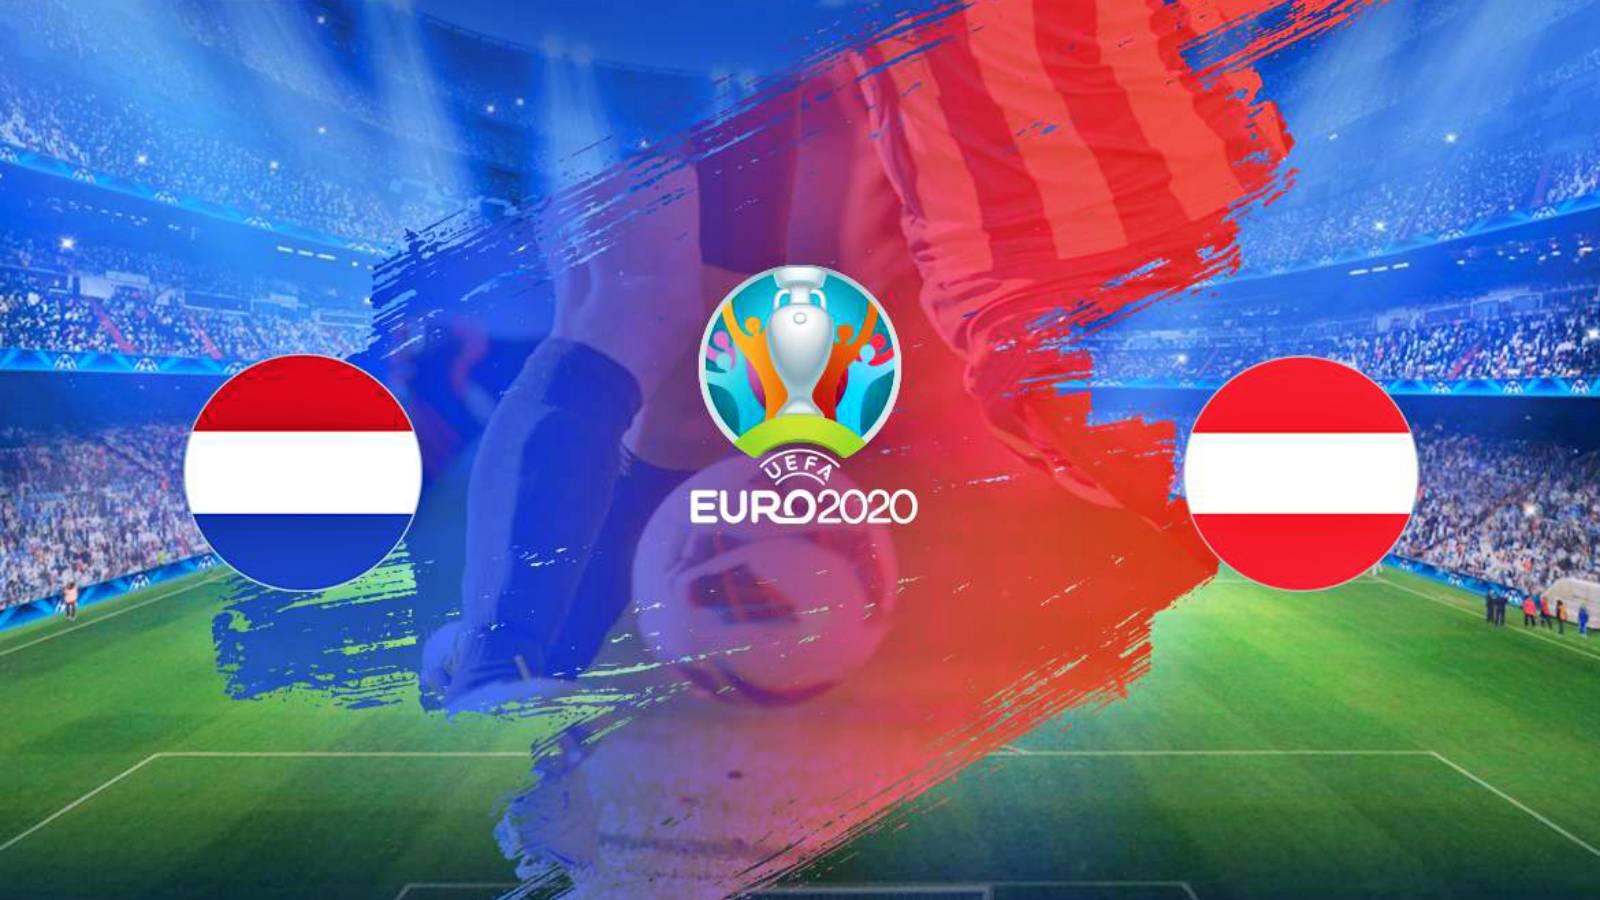 OLANDA - AUSTRIA LIVE PRO TV EURO 2020